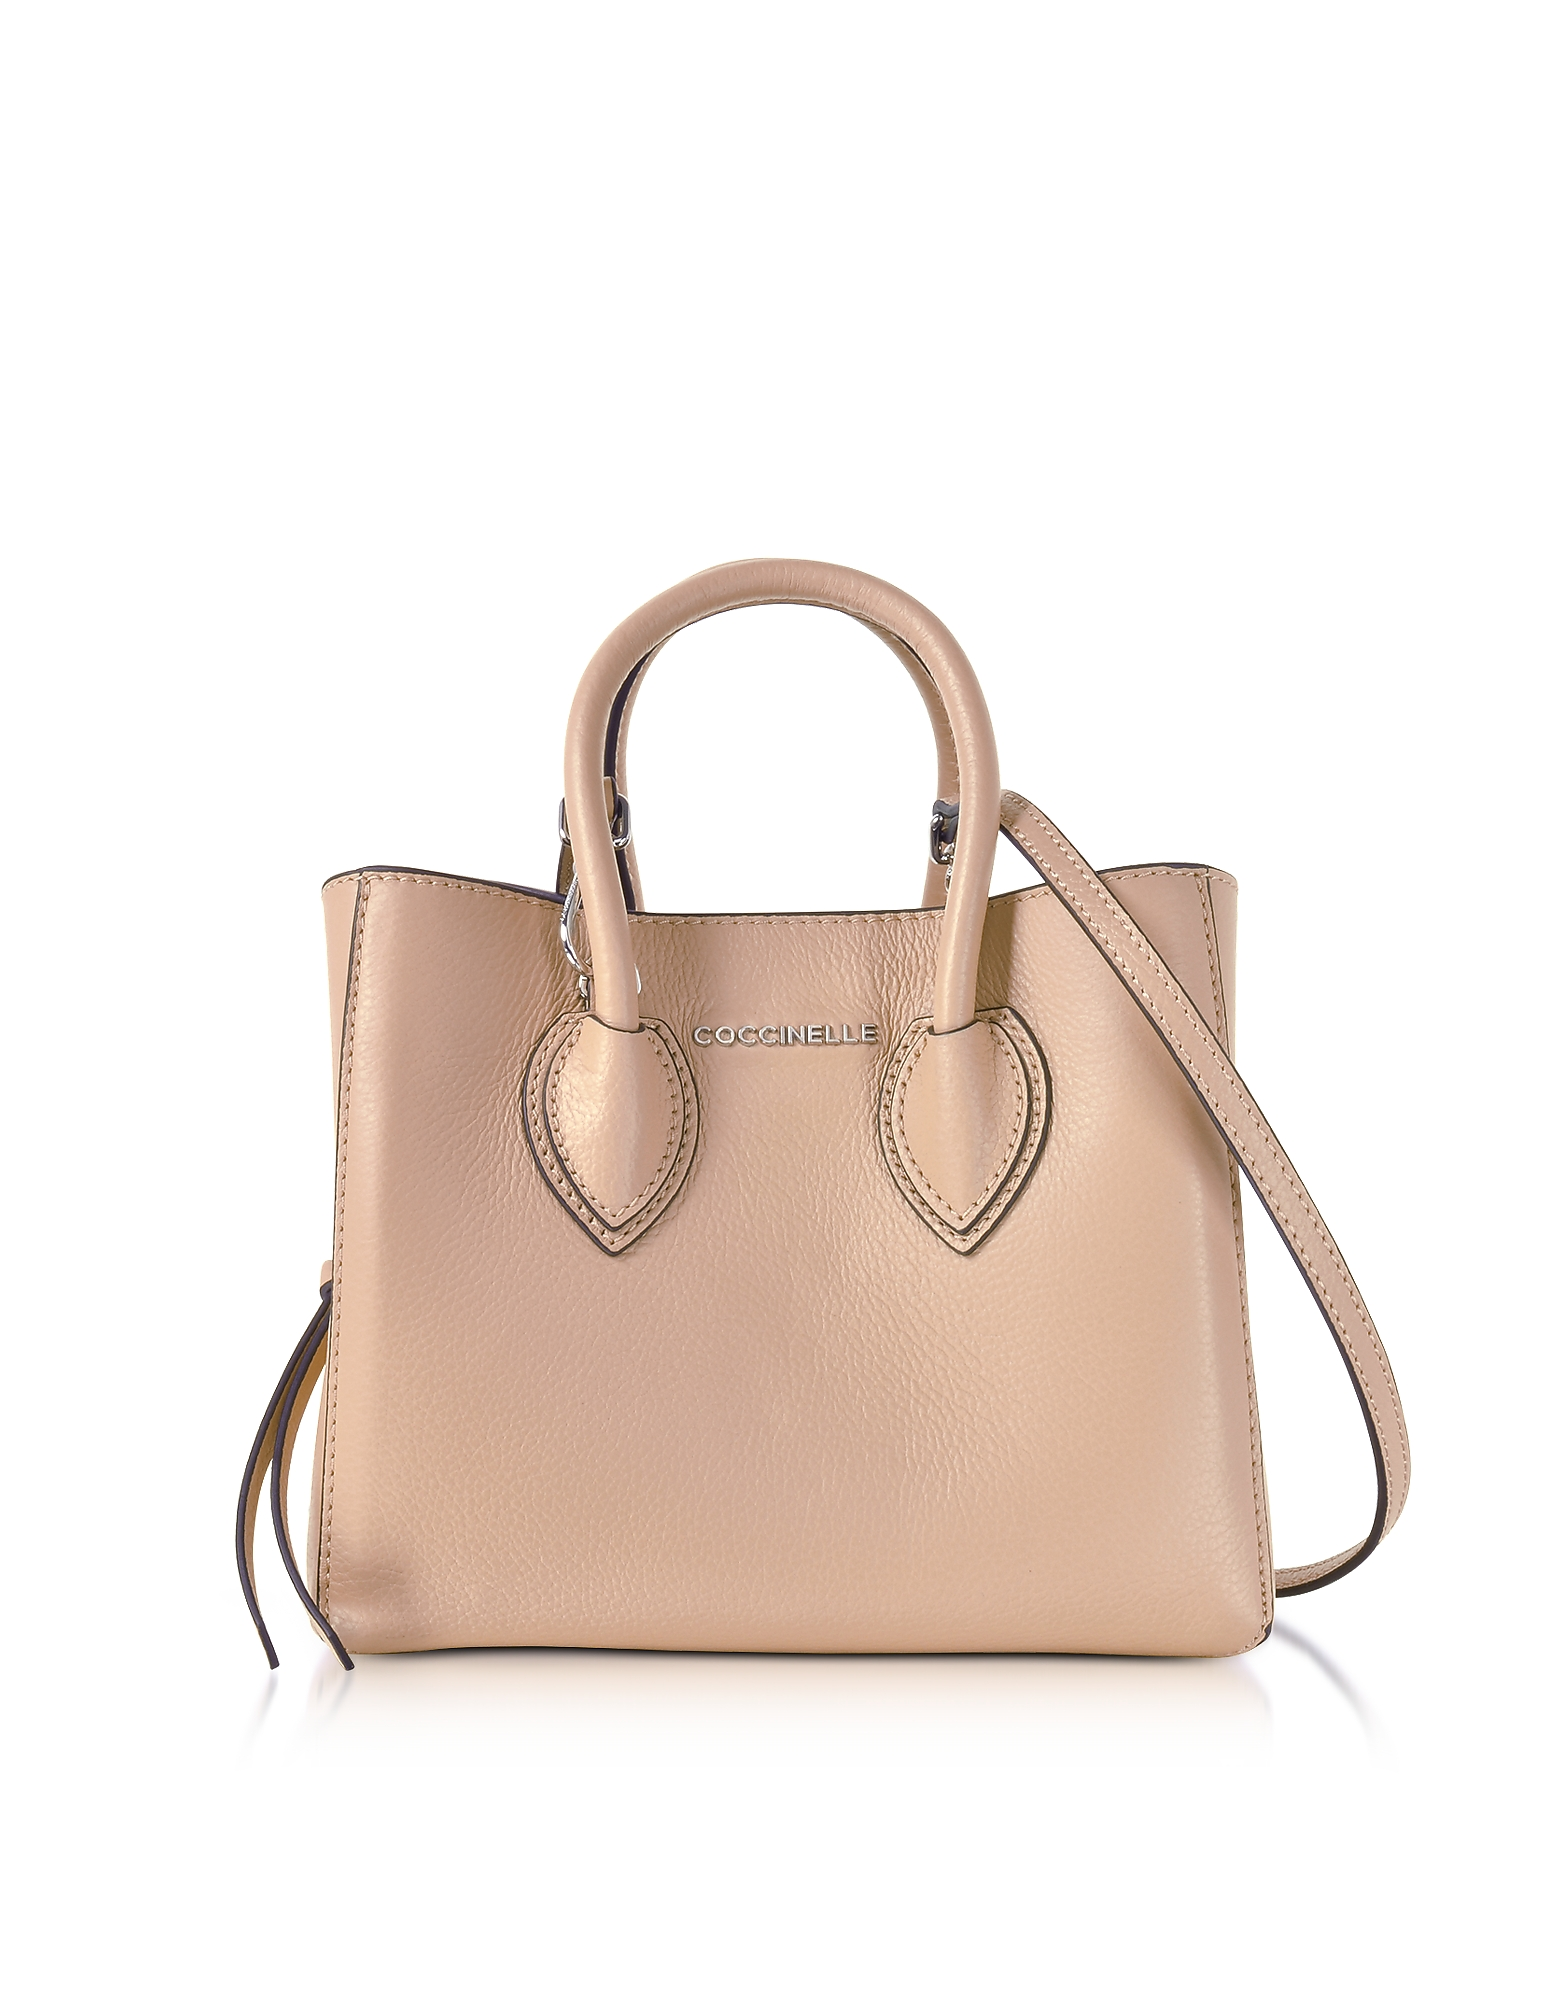 Coccinelle Handbags, Farisa Pebbled Leather Mini Tote Bag